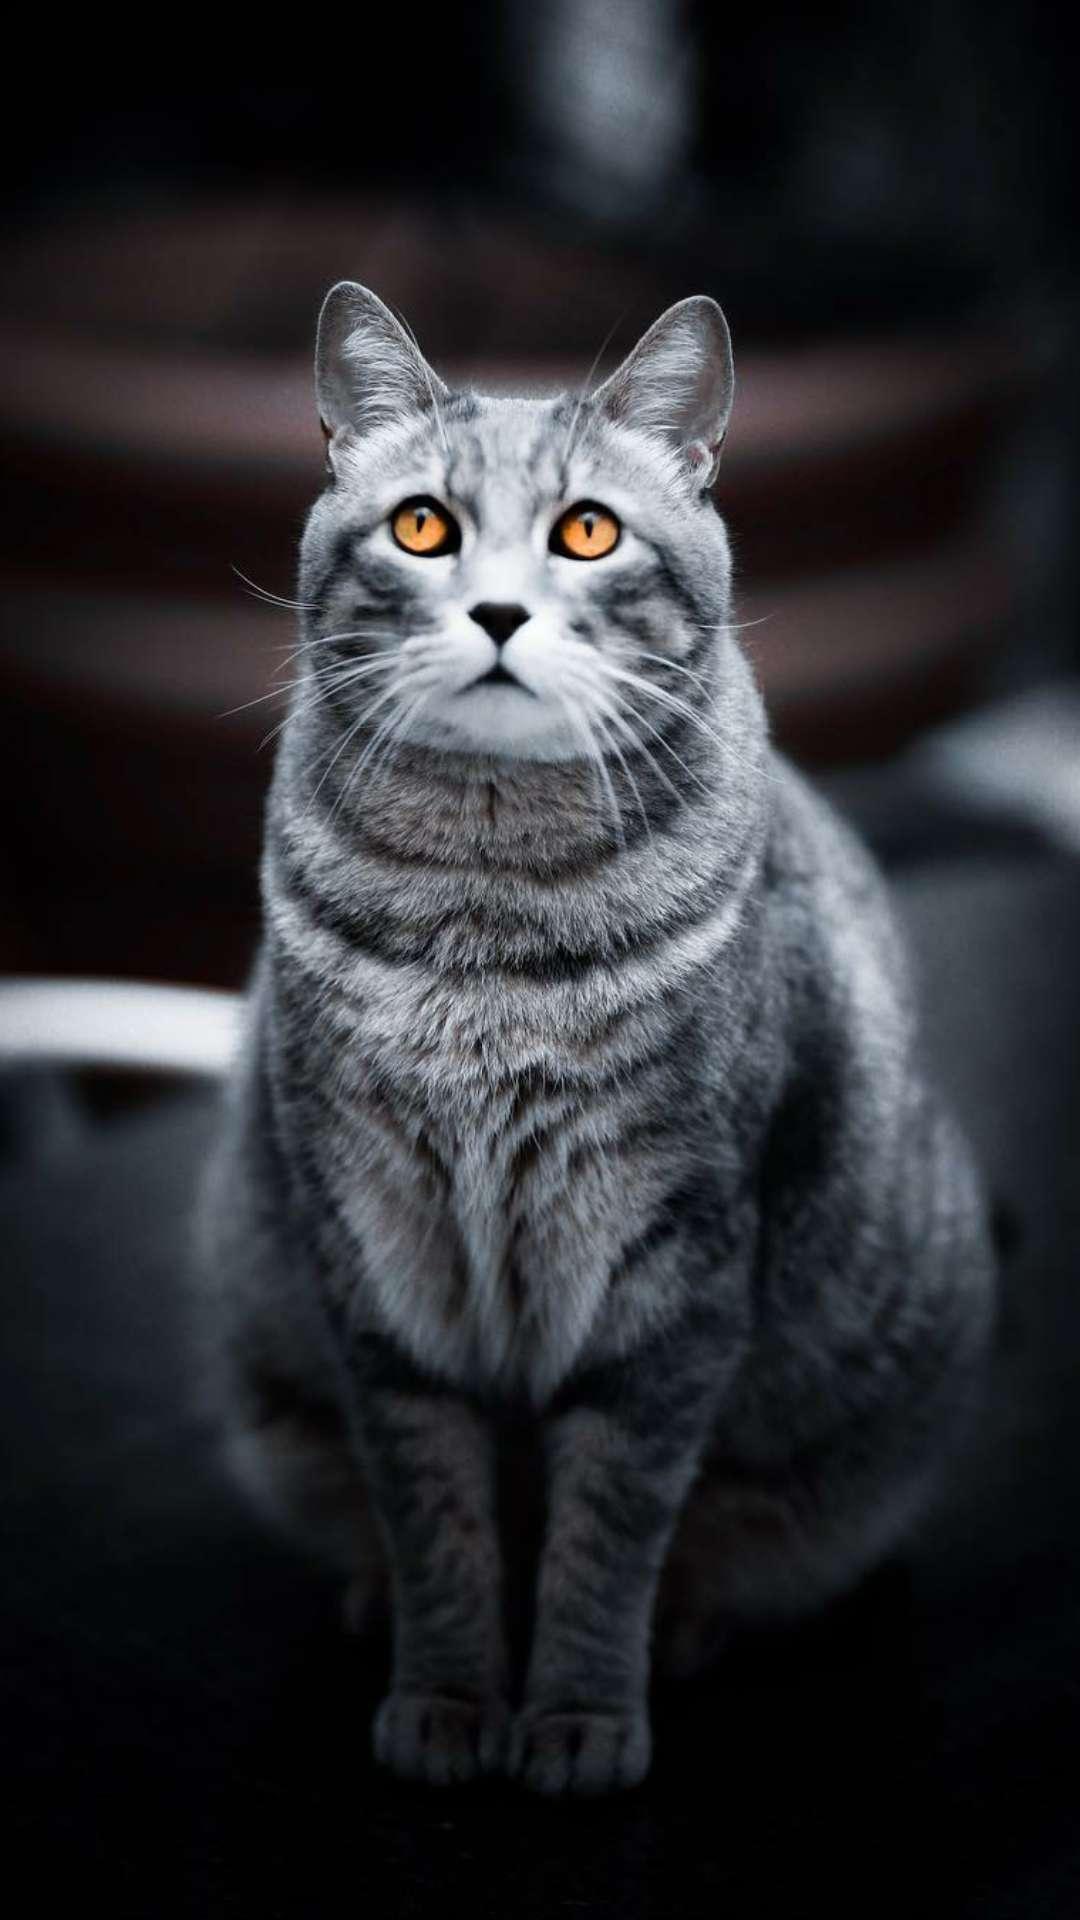 Dark Cat iPhone Wallpaper